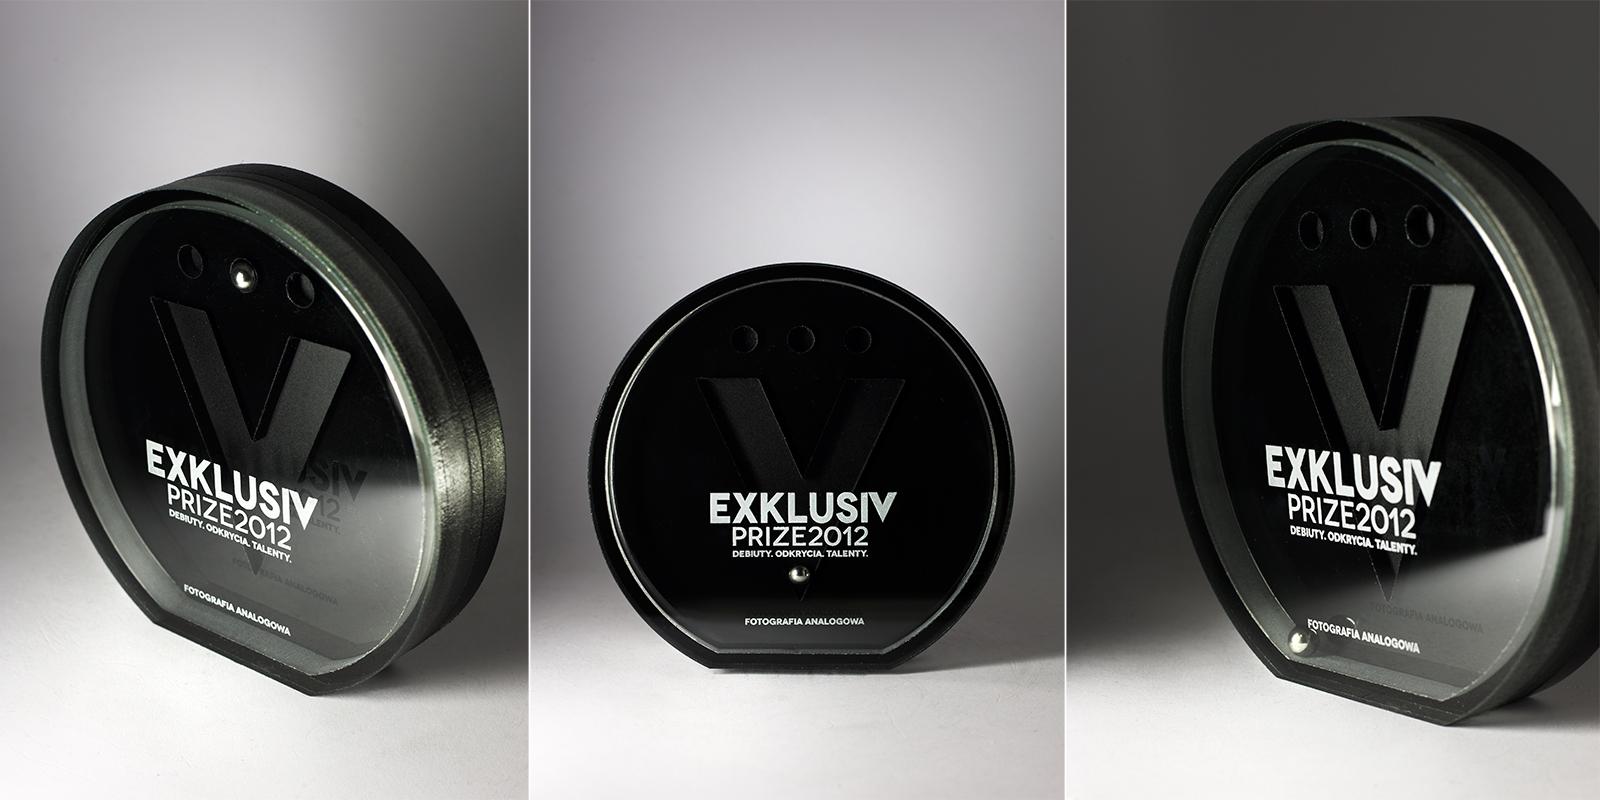 statuetka-exklusiv-prize-2012